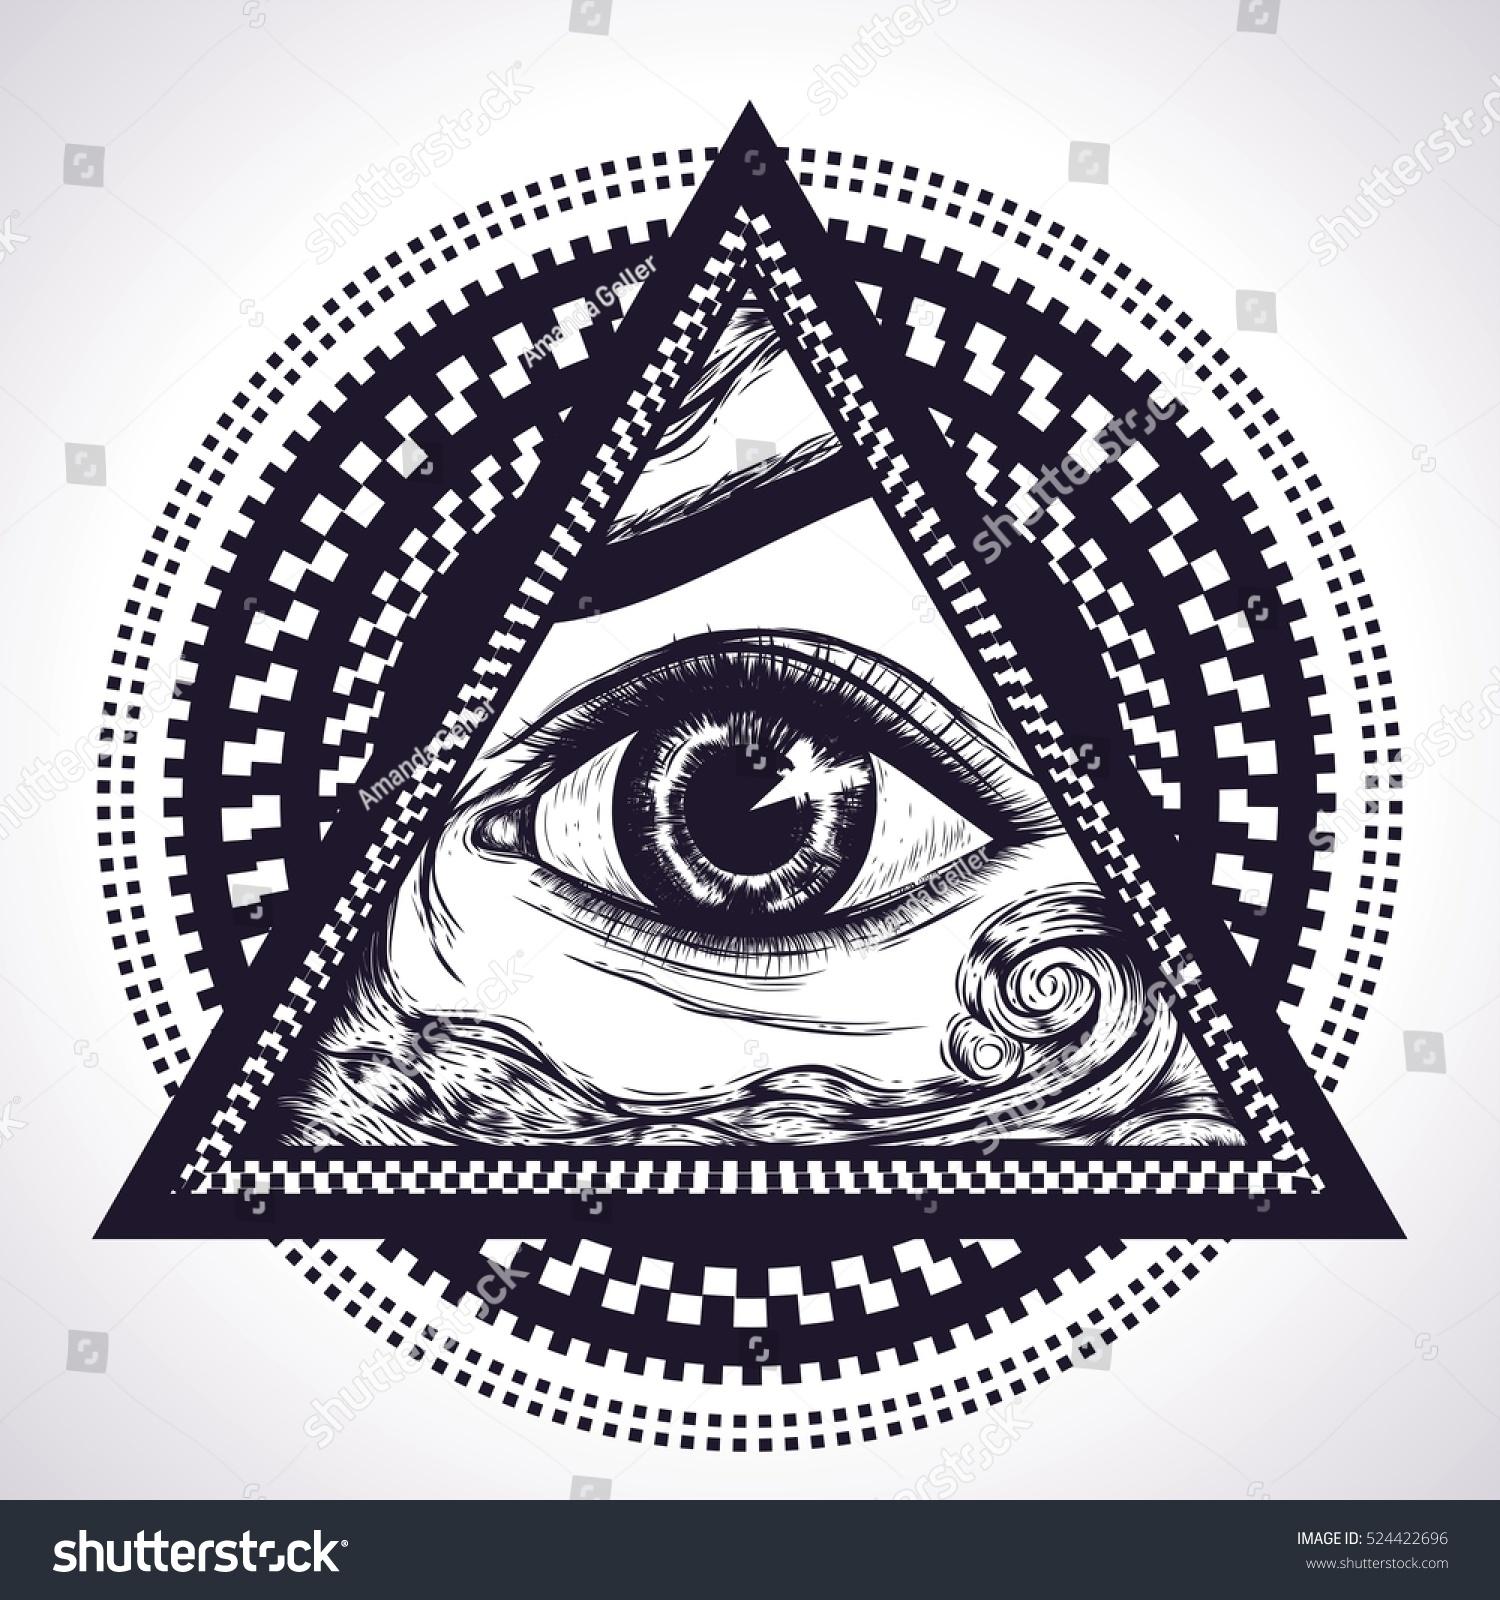 All Seeing Eye Pyramid Symbol Hypnotic Stock Vector Royalty Free